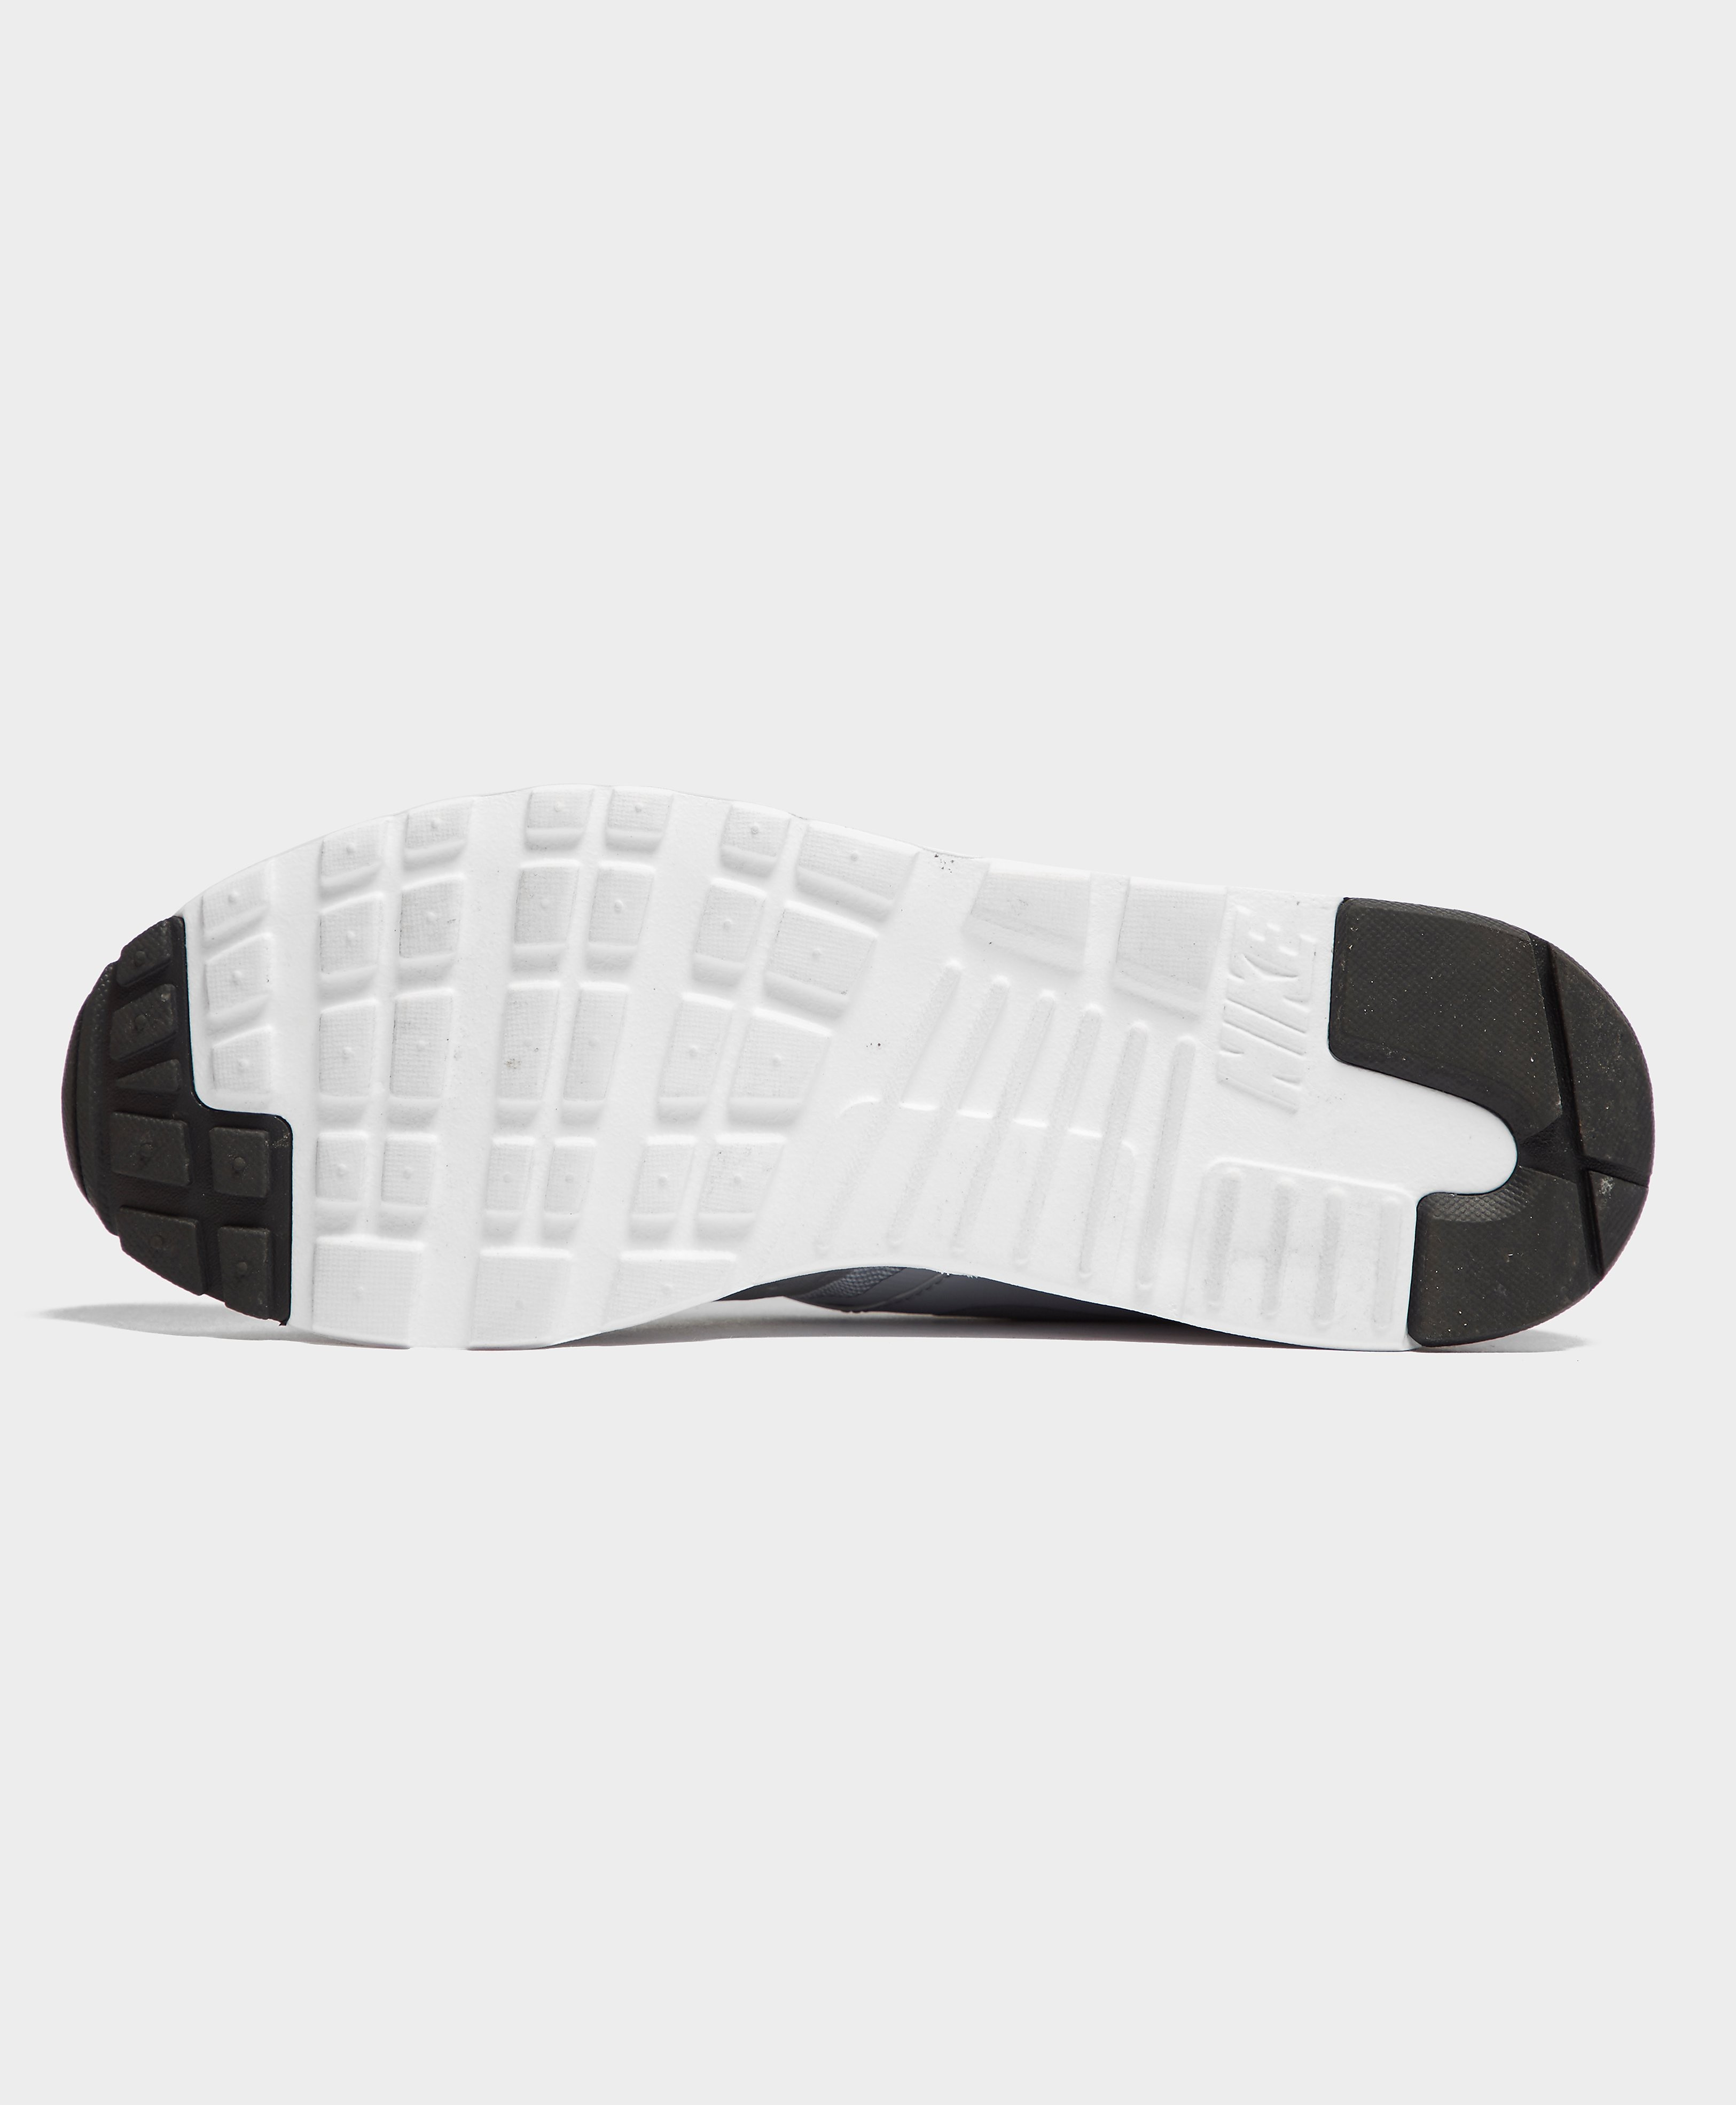 Nike Max Vision 97